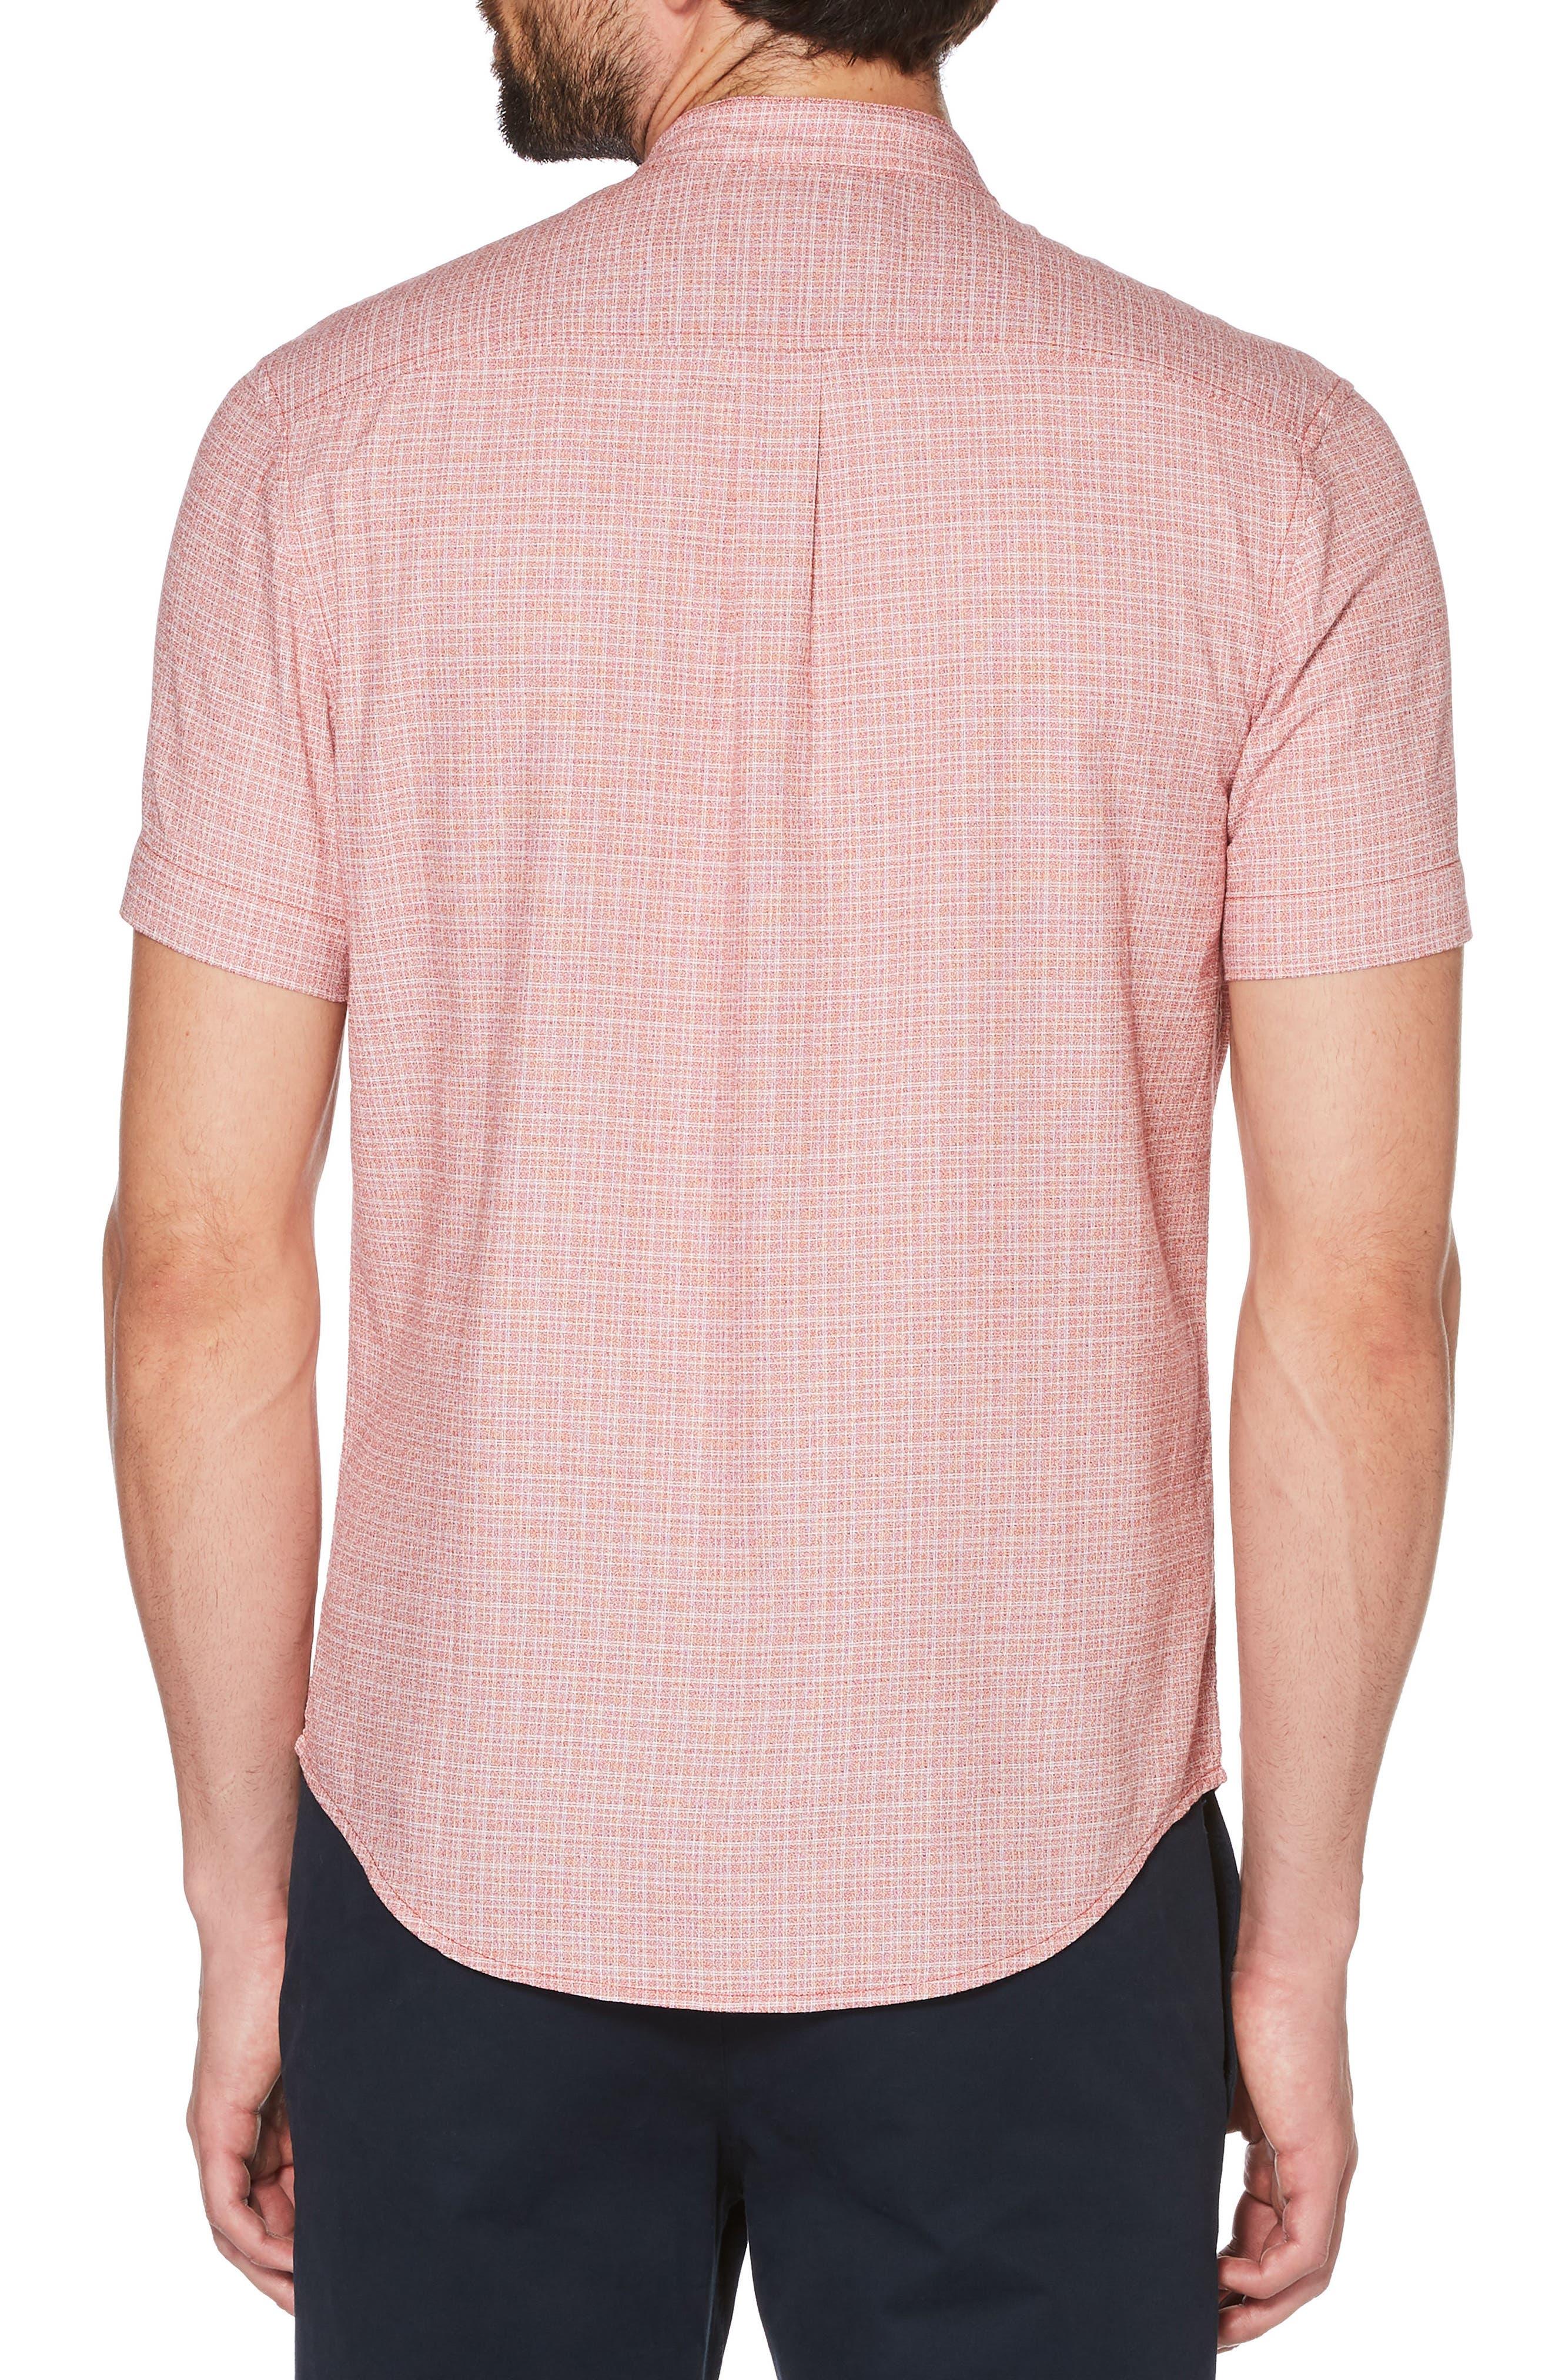 Crosshatch Shirt,                             Alternate thumbnail 2, color,                             660